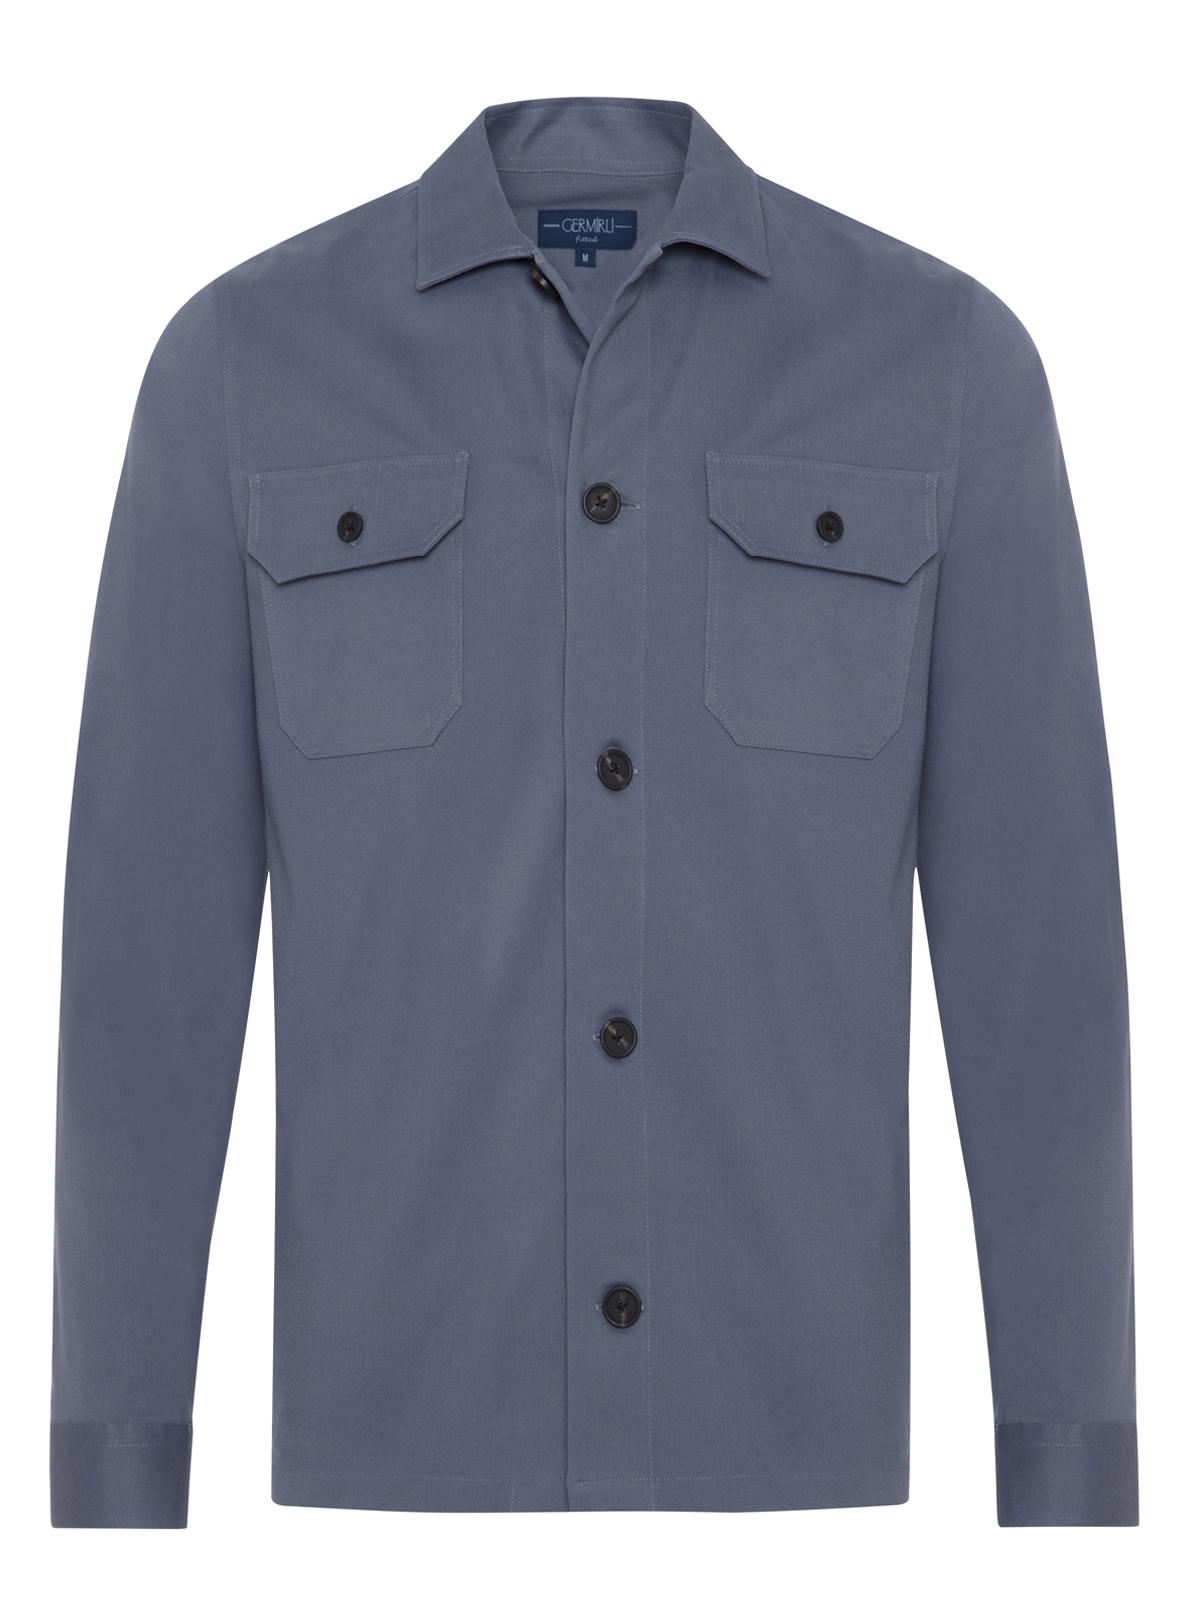 Germirli Gri Mavi Diagonel Dokulu Tailor Fit Ceket Gömlek